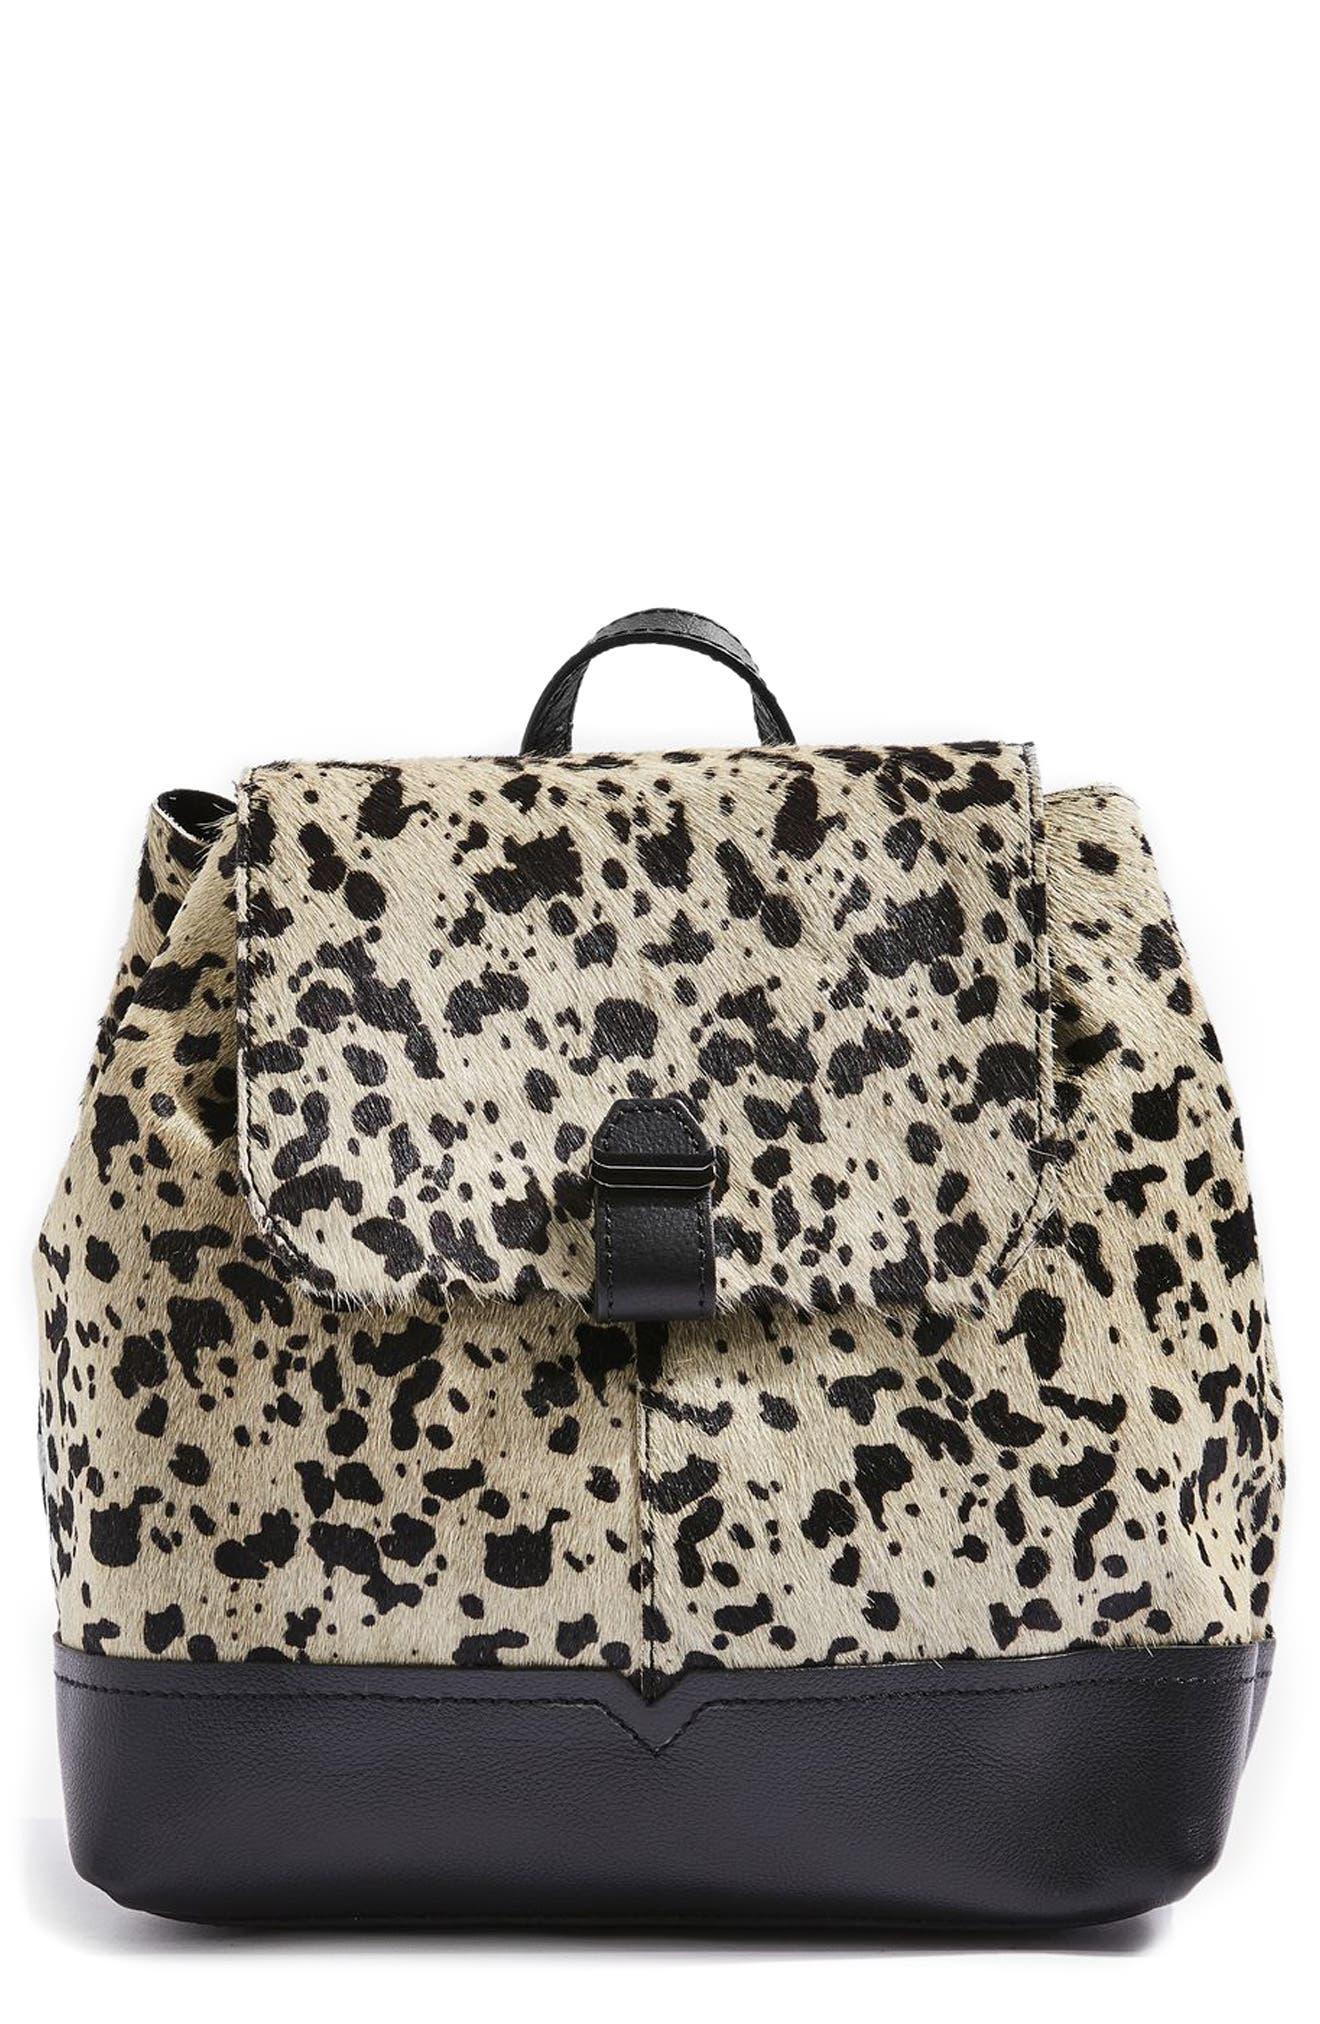 TOPSHOP Premium Leather & Genuine Calf Hair Backpack, Main, color, 100